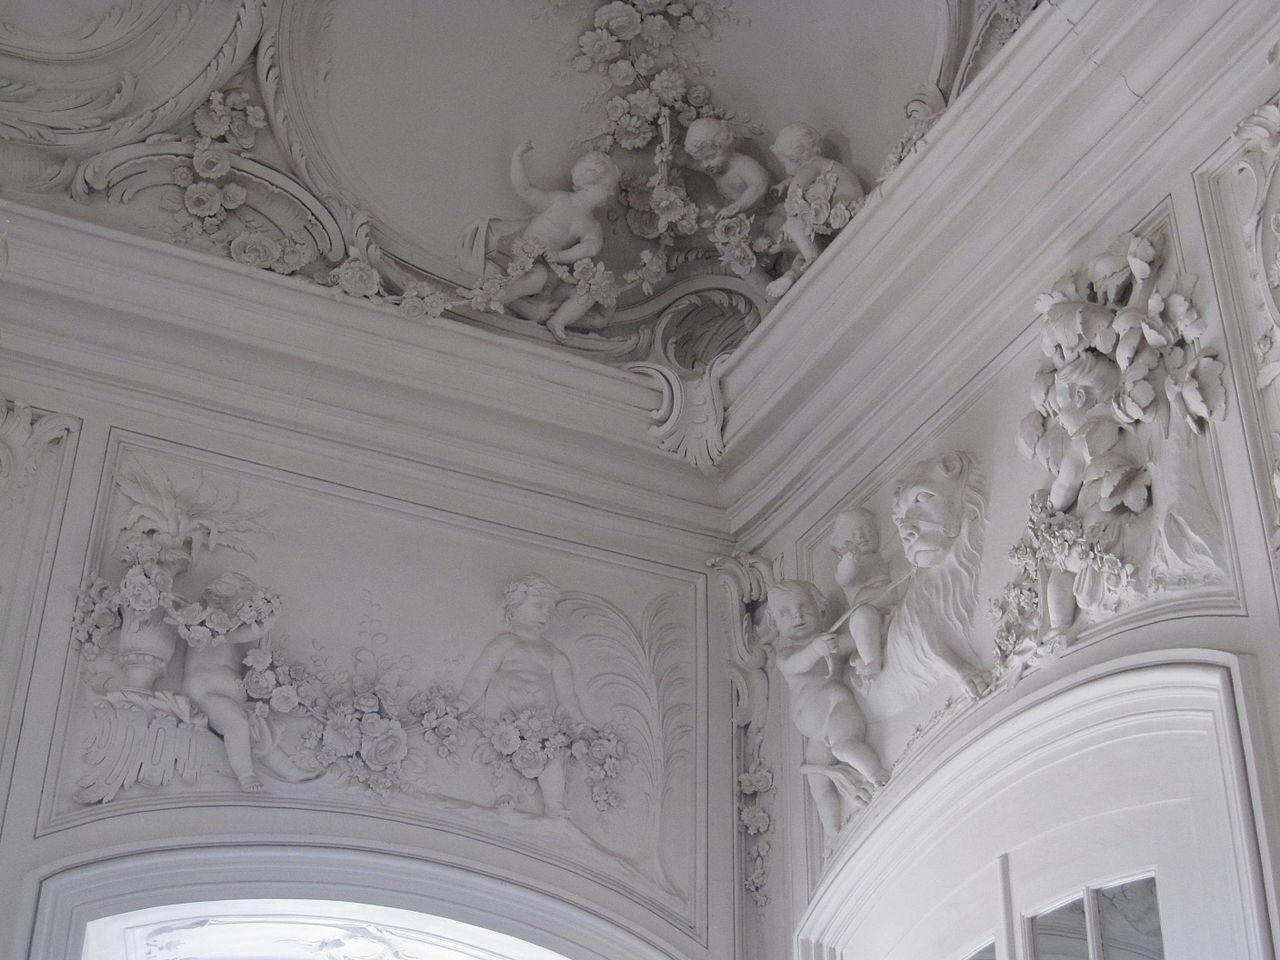 FileRundale palace interior stucco decorationsjpg